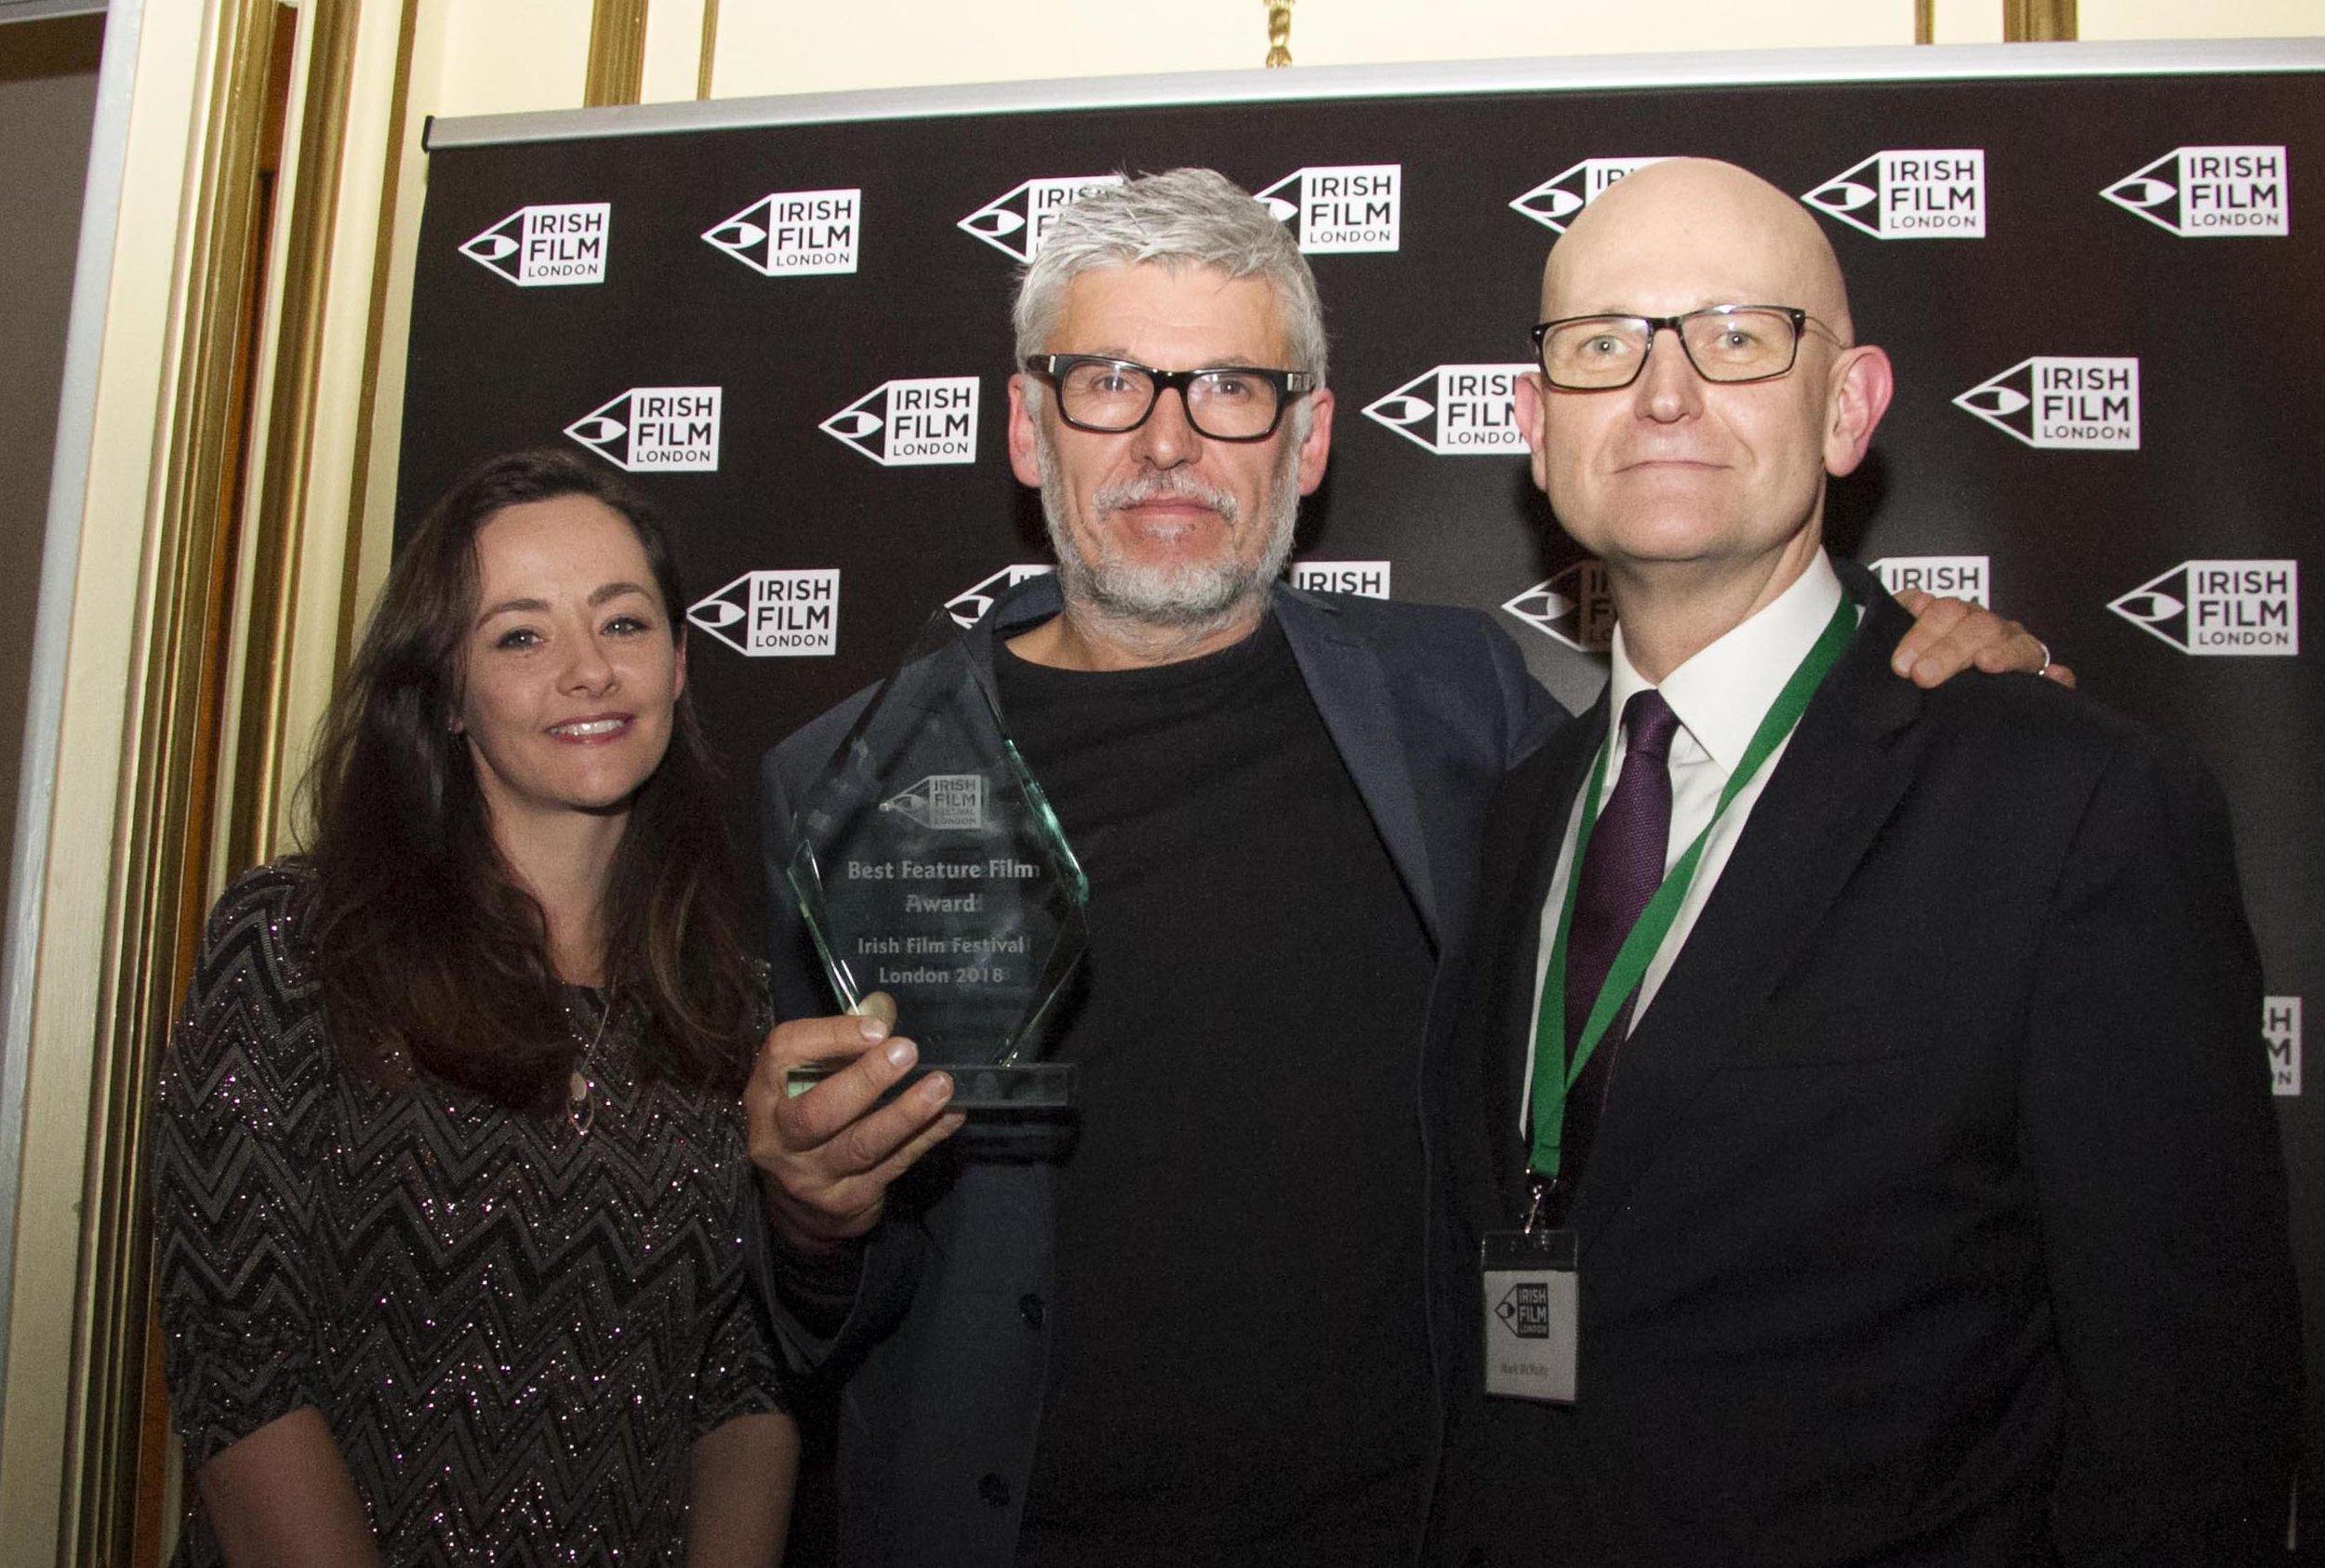 Kelly O Connor Irish Film London with Paddy Brethnach Rosie and Mark McNulty.jpg